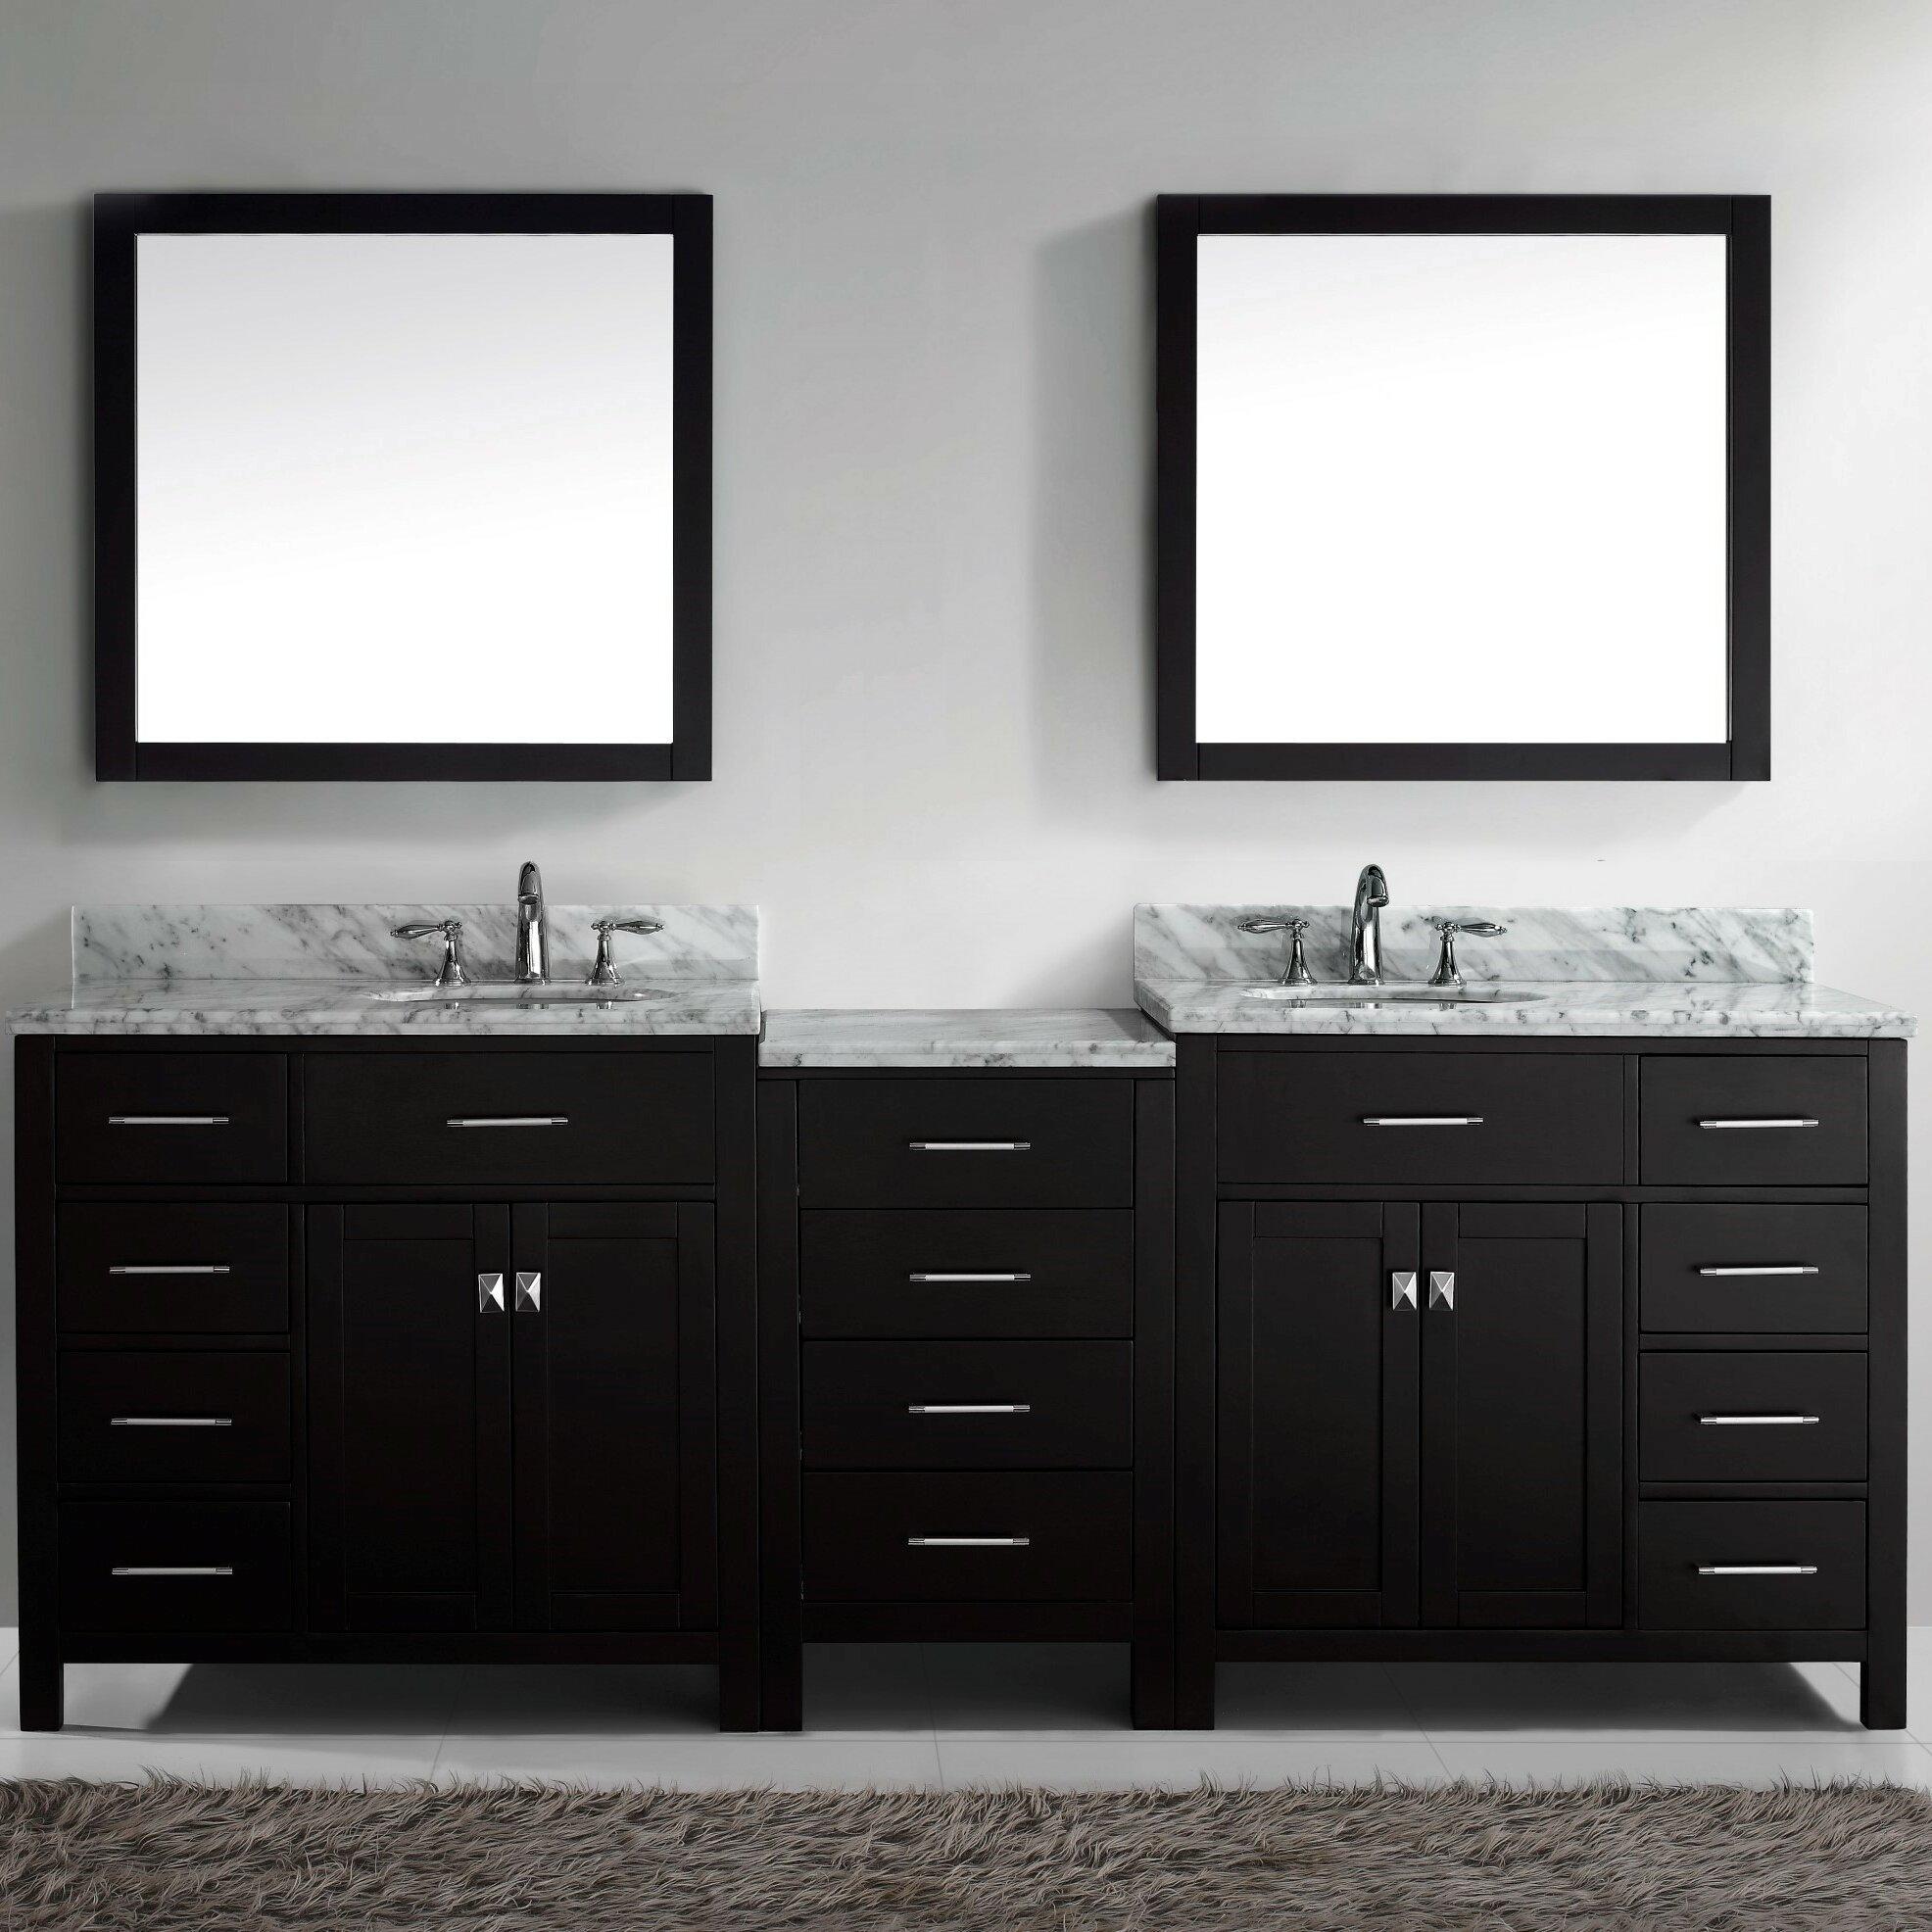 Double bathroom vanity - Stoughton 92 8 Double Bathroom Vanity Set With Carrara White Top And Mirror